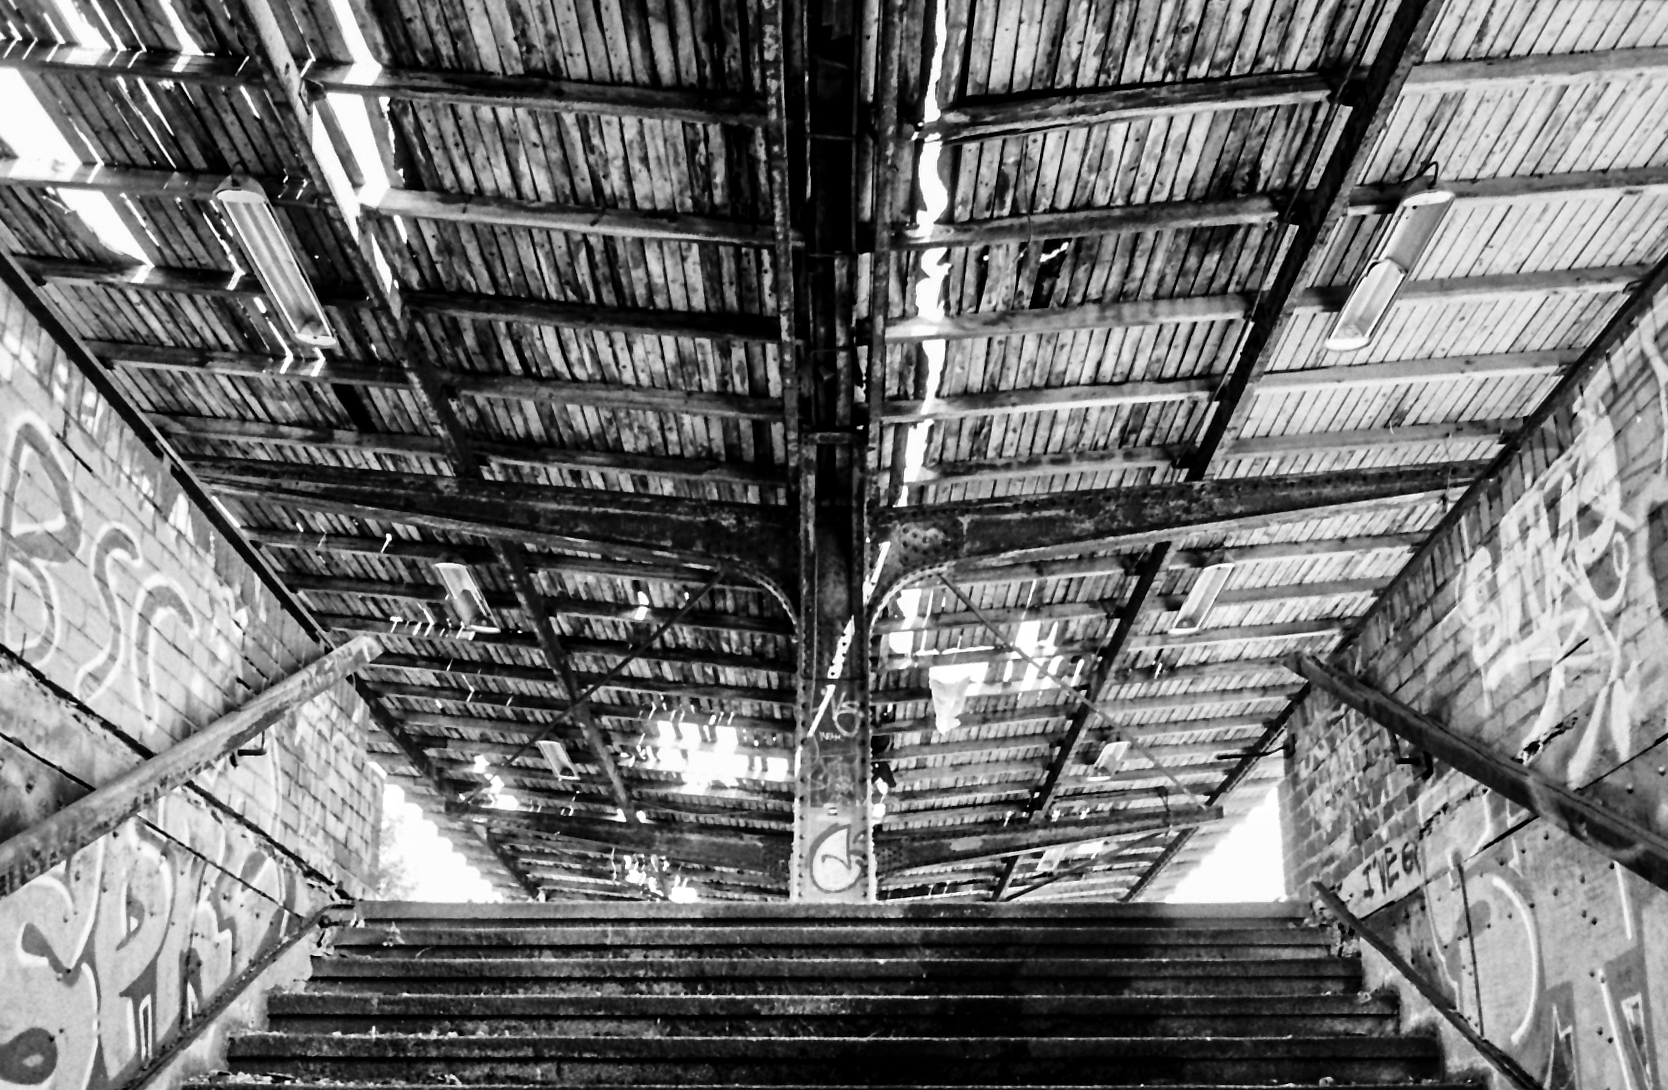 stazione fantasma